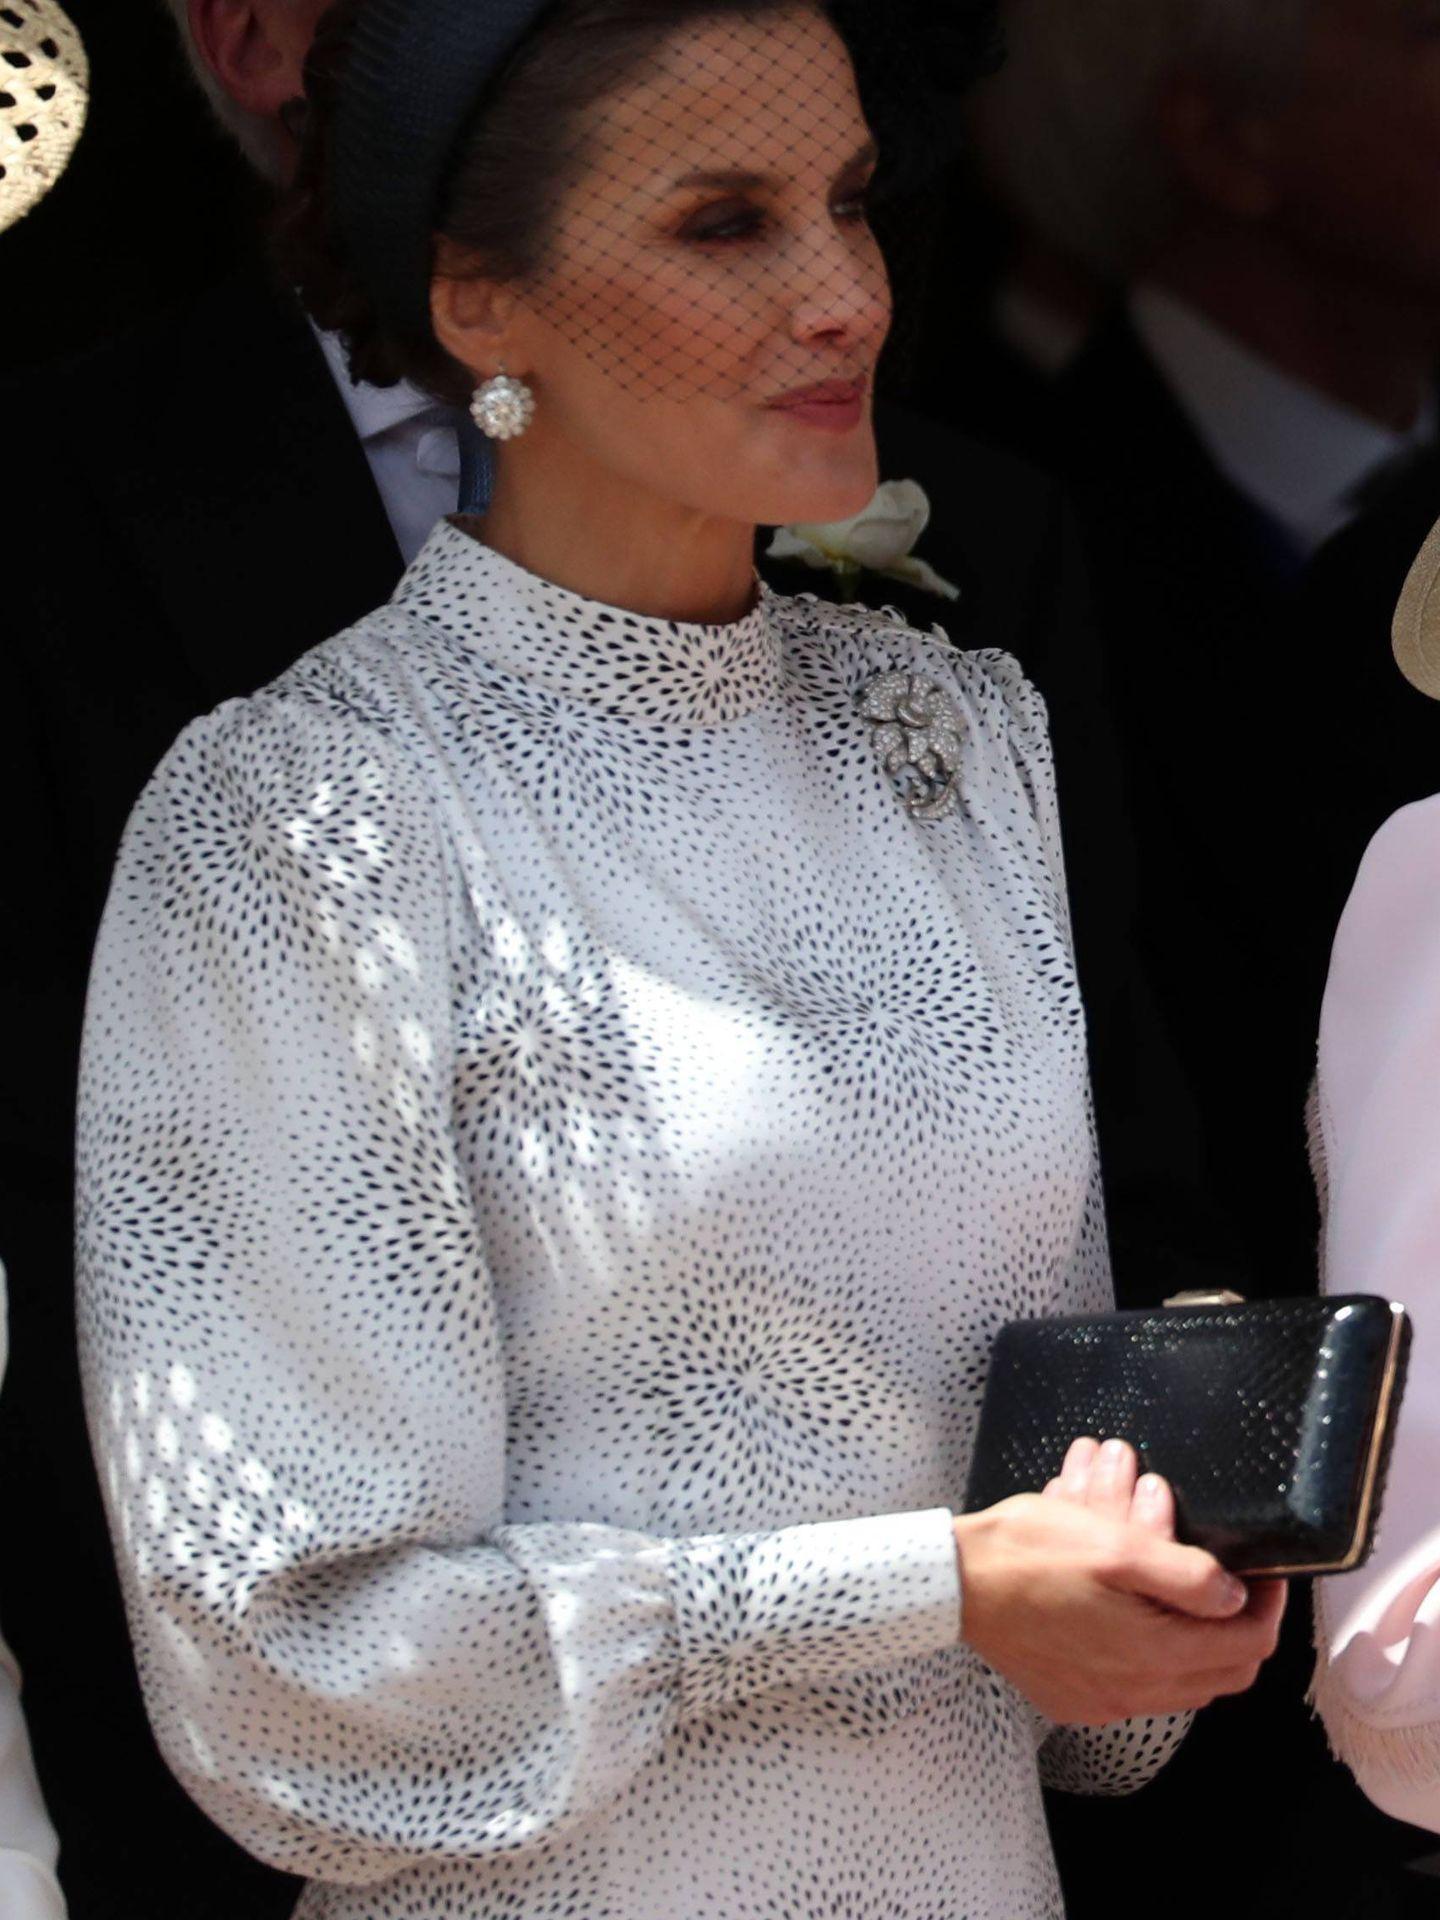 La Reina con su clutch de Jimmy Choo. (CP)